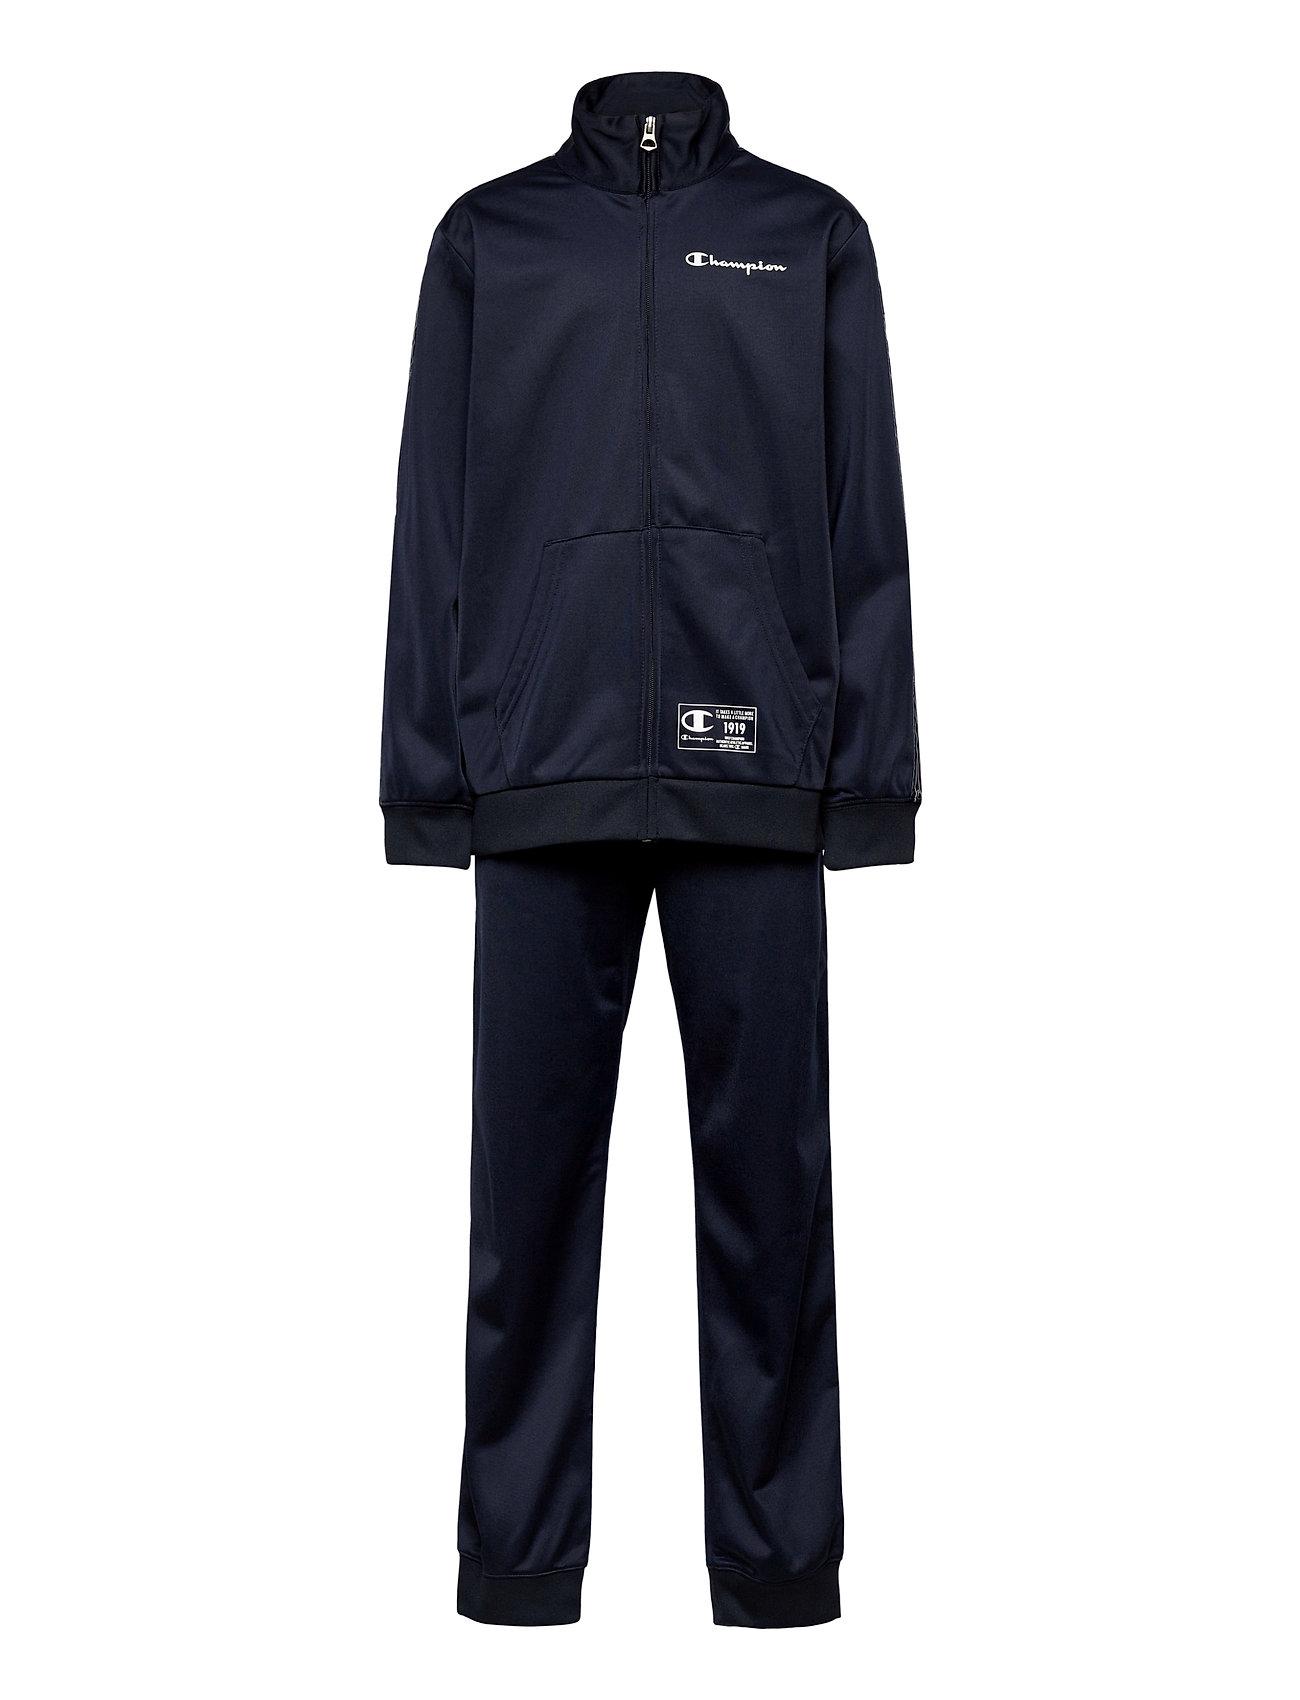 Image of Full Zip Suit Tracksuit Blå Champion (3444701105)